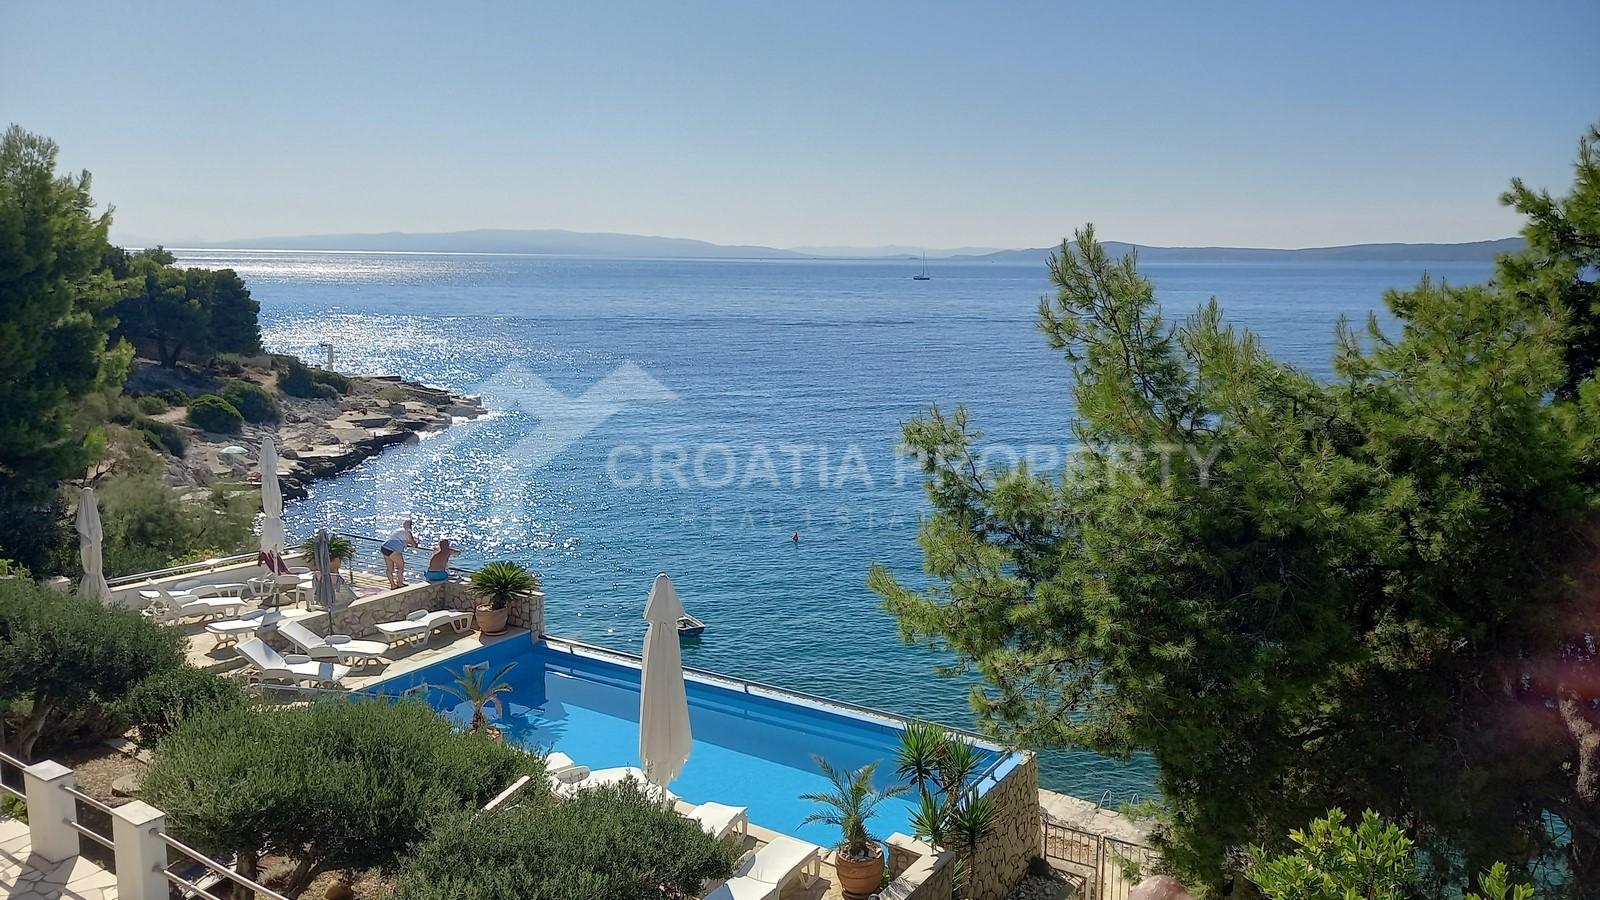 Attractive property on Ciovo island